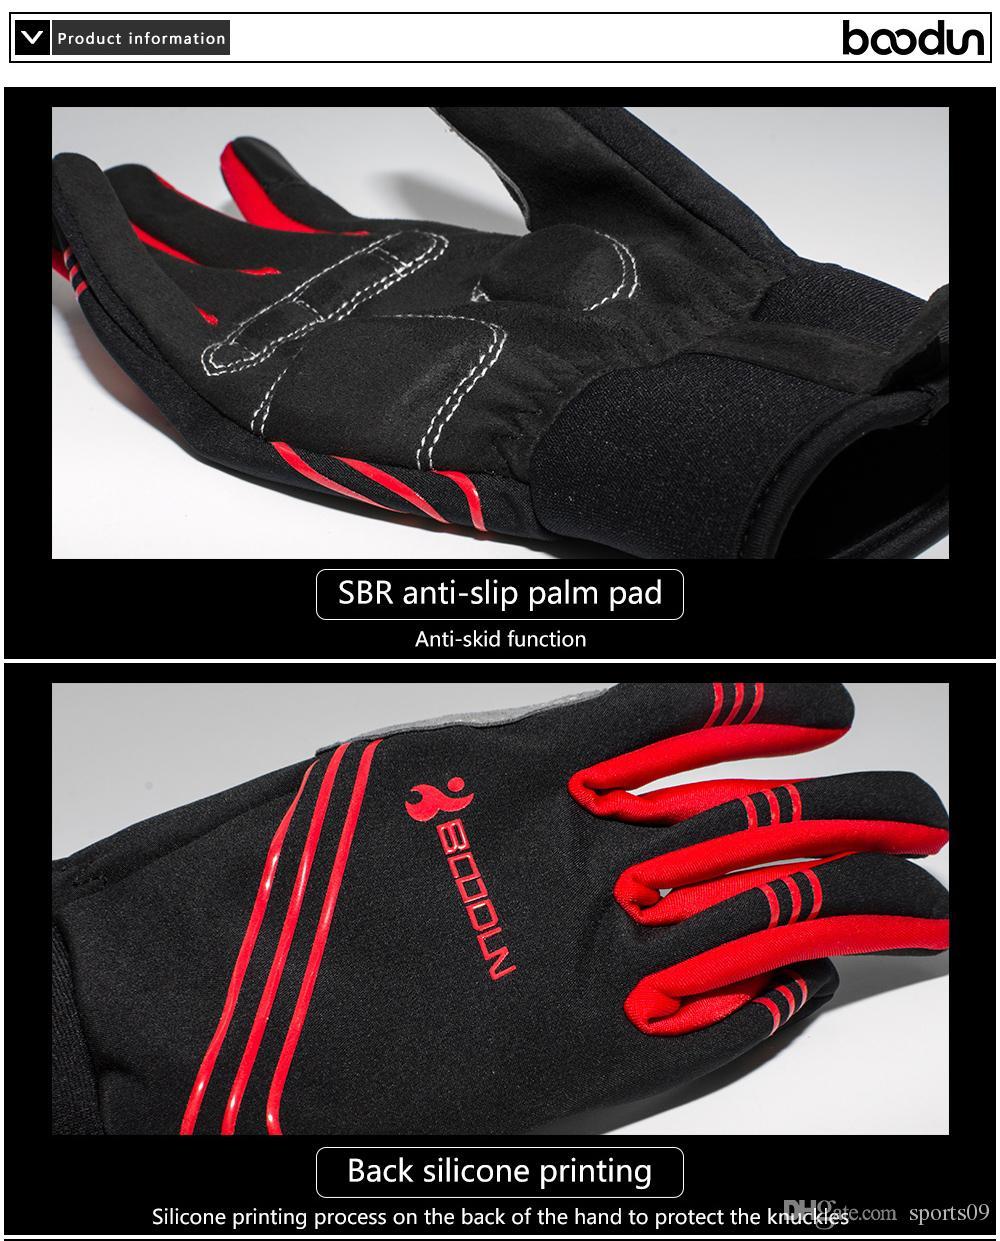 Boodun Winter Riding Cycling Gloves Men And Women Warm Gloves Anti-Skid Shock Mountain Bike Riding Gloves Full Finger 2018 Protective Gear